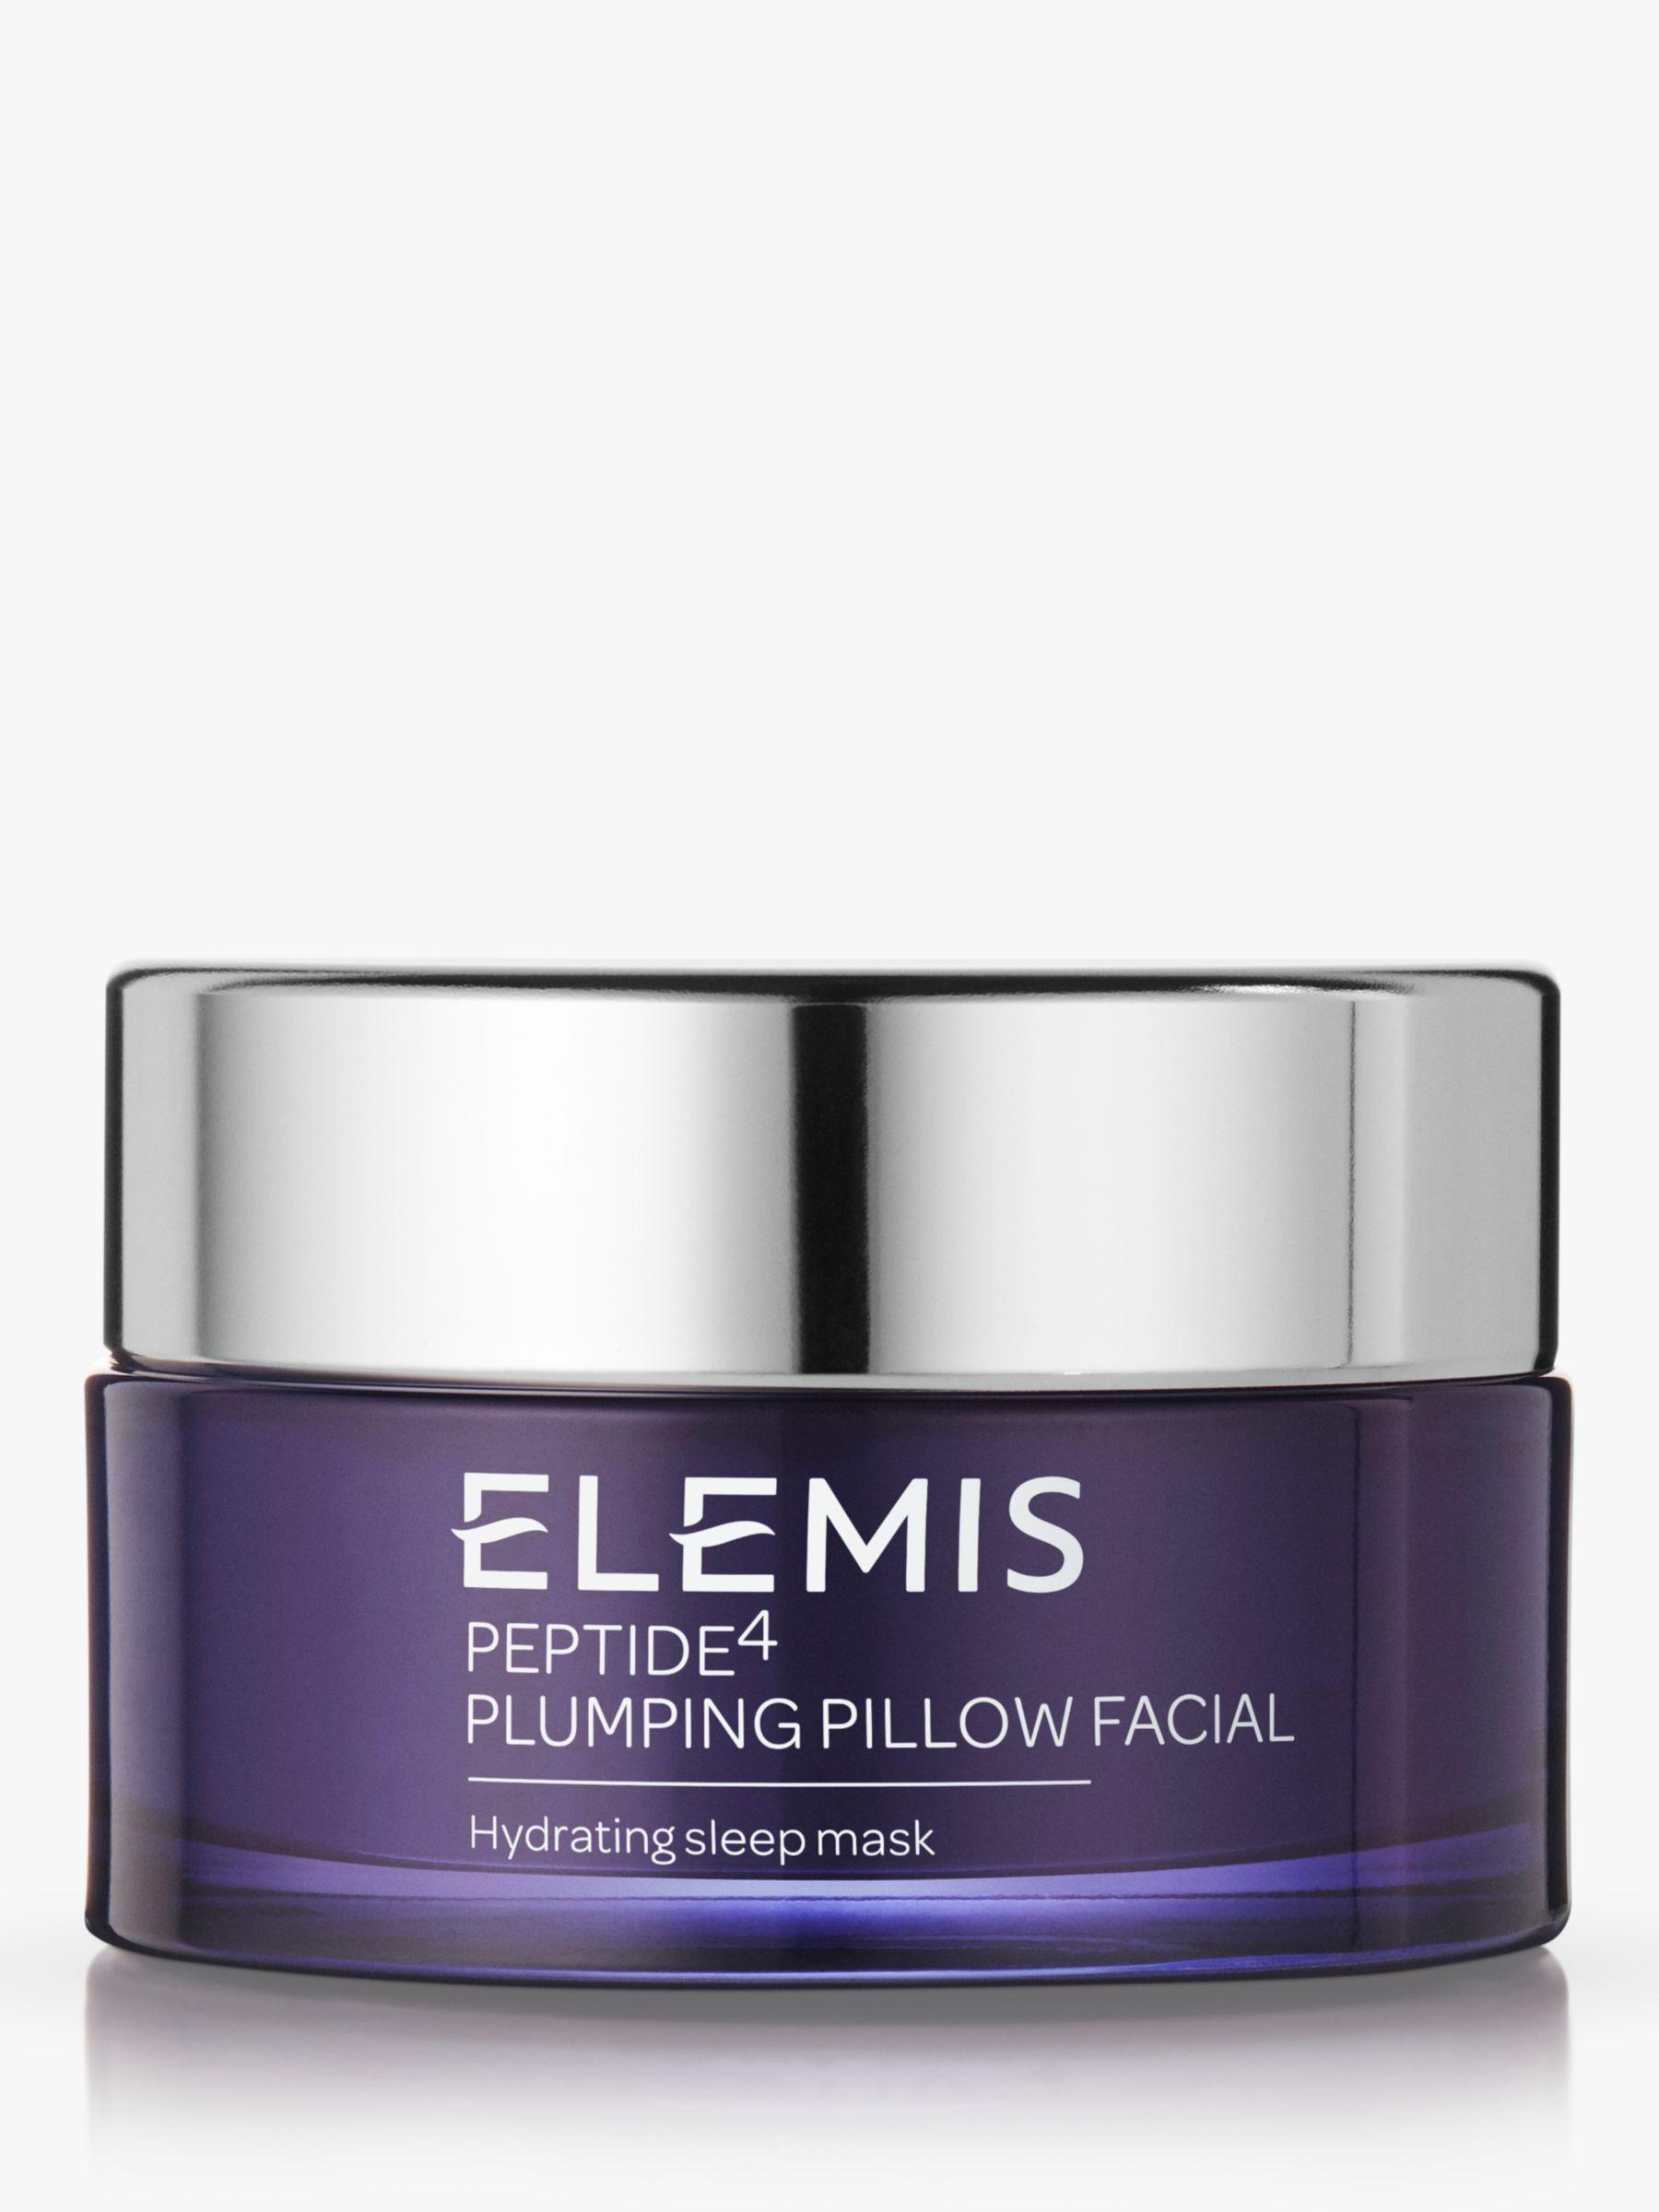 Elemis Elemis Peptide4 Plumping Pillow Facial Hydrating Sleep Mask, 50ml